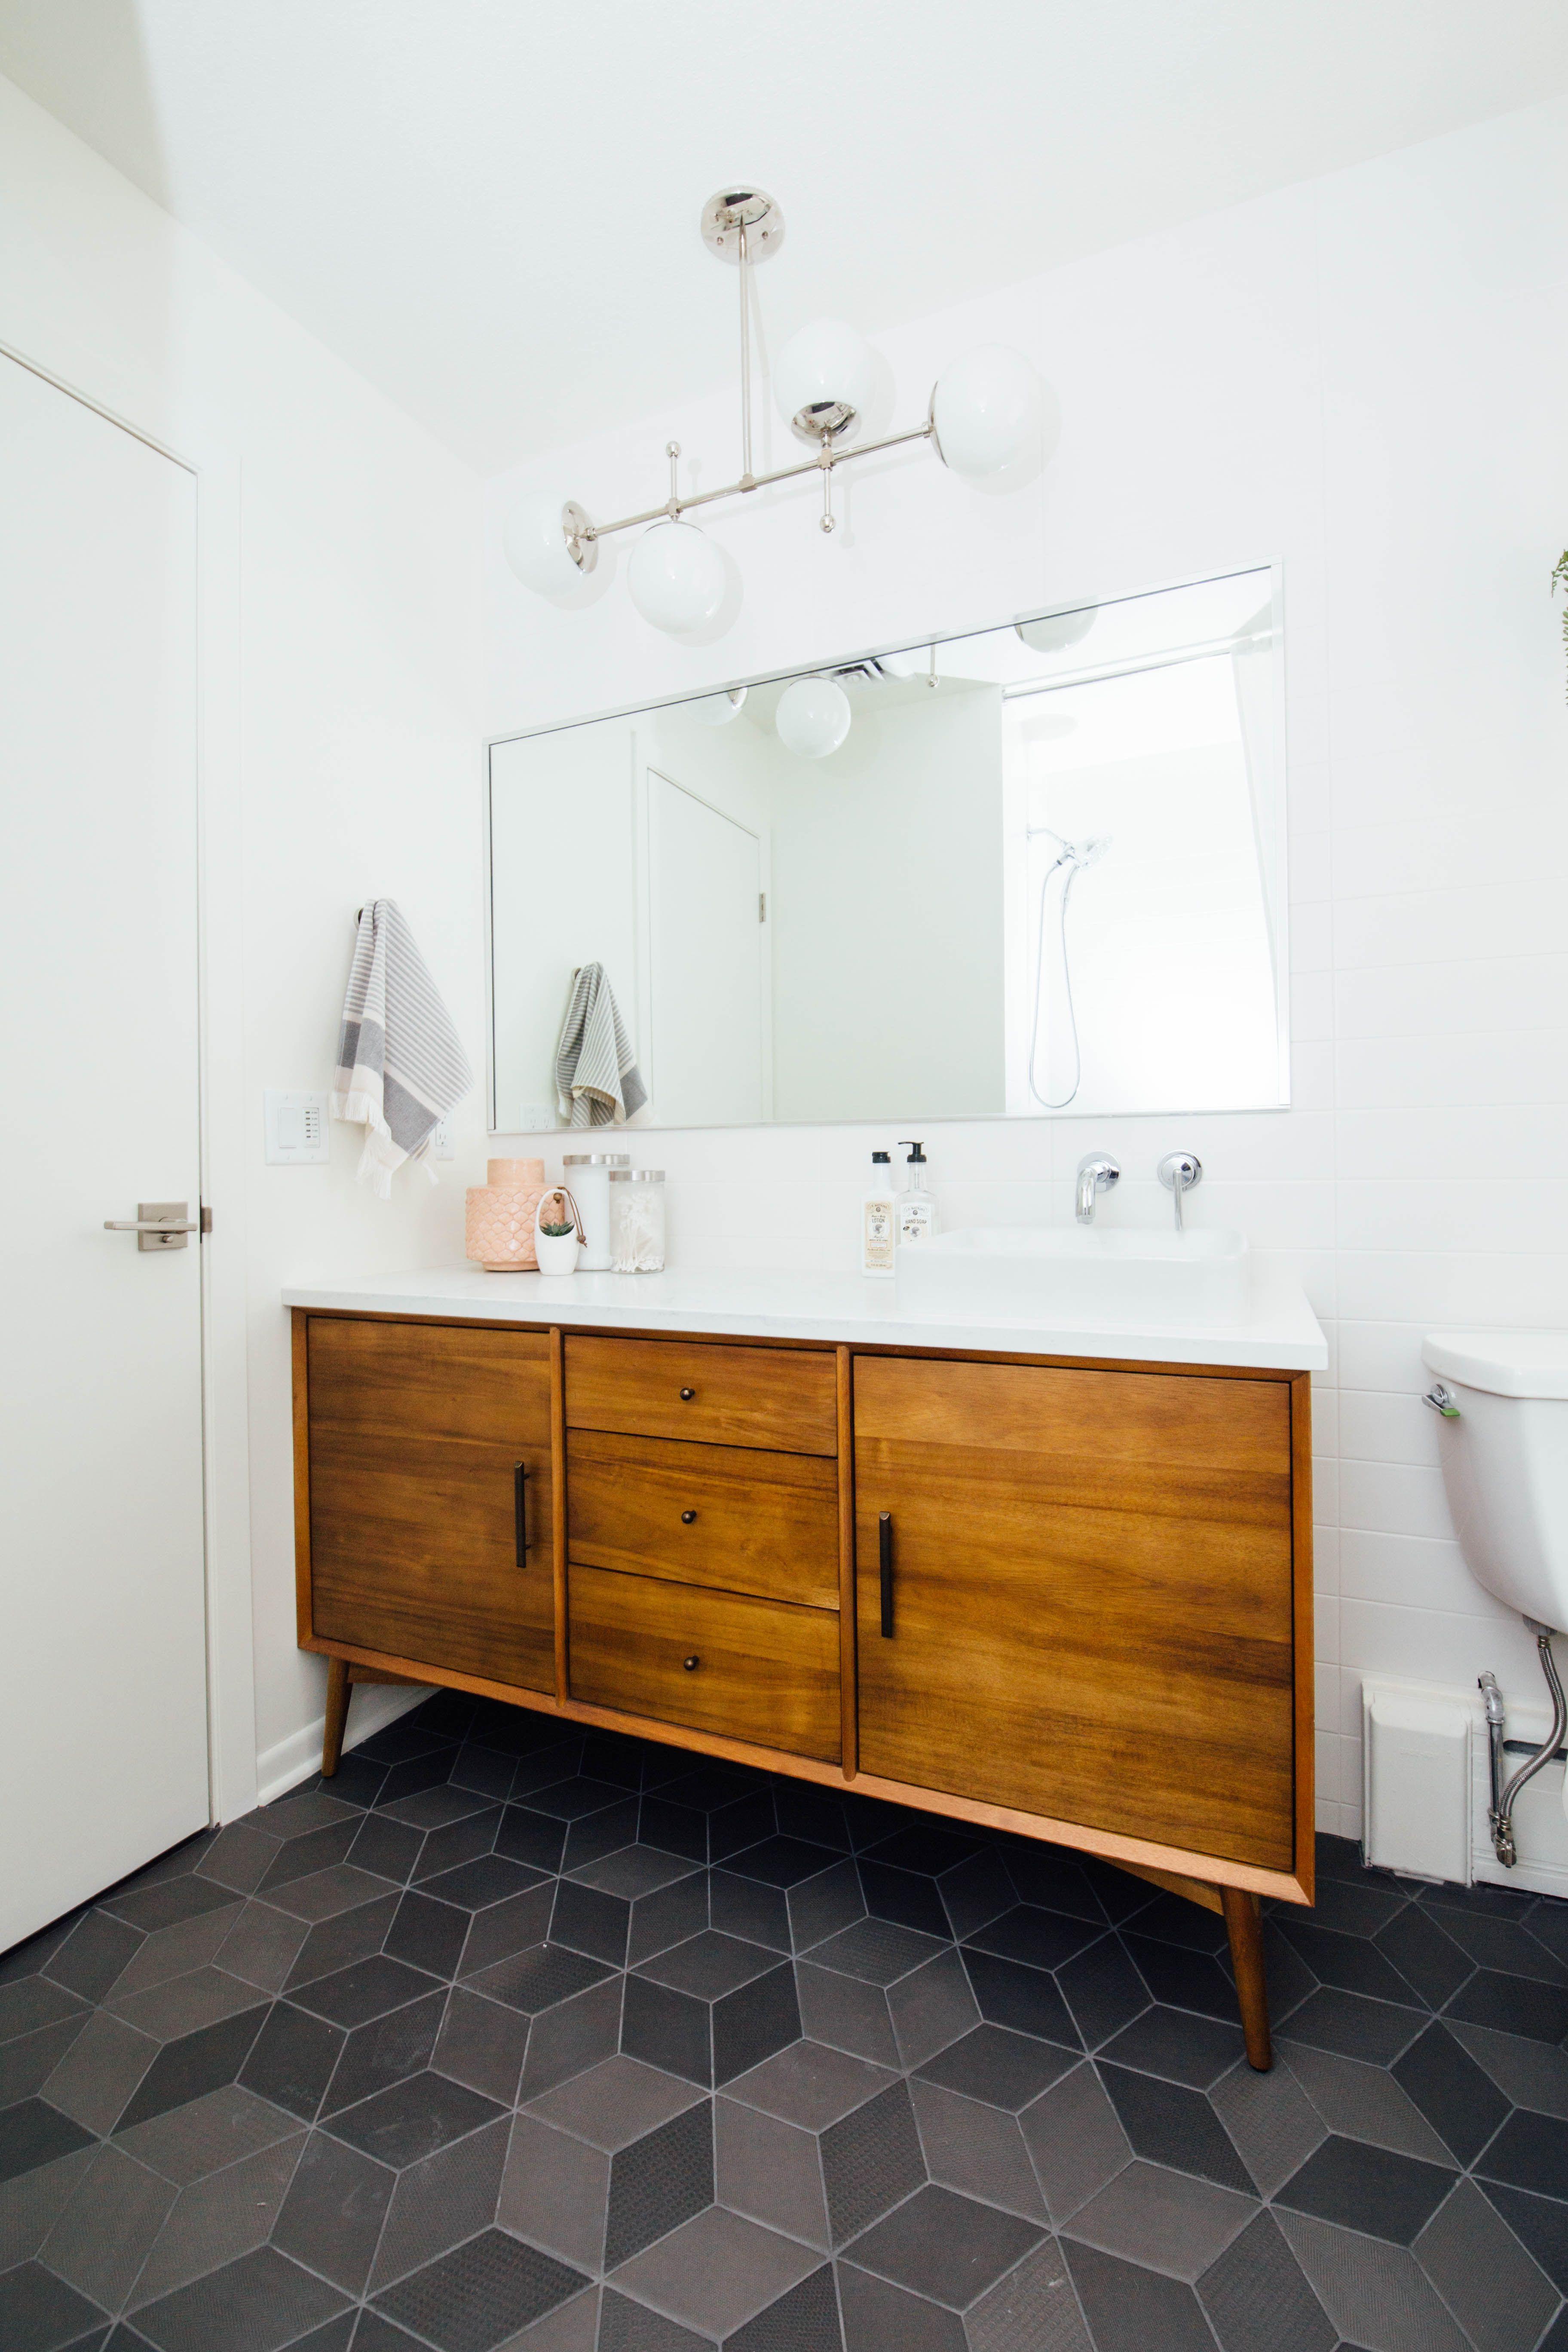 Hellorefuge main bathroom reno mutina text tiles west elm vanity dutton brown